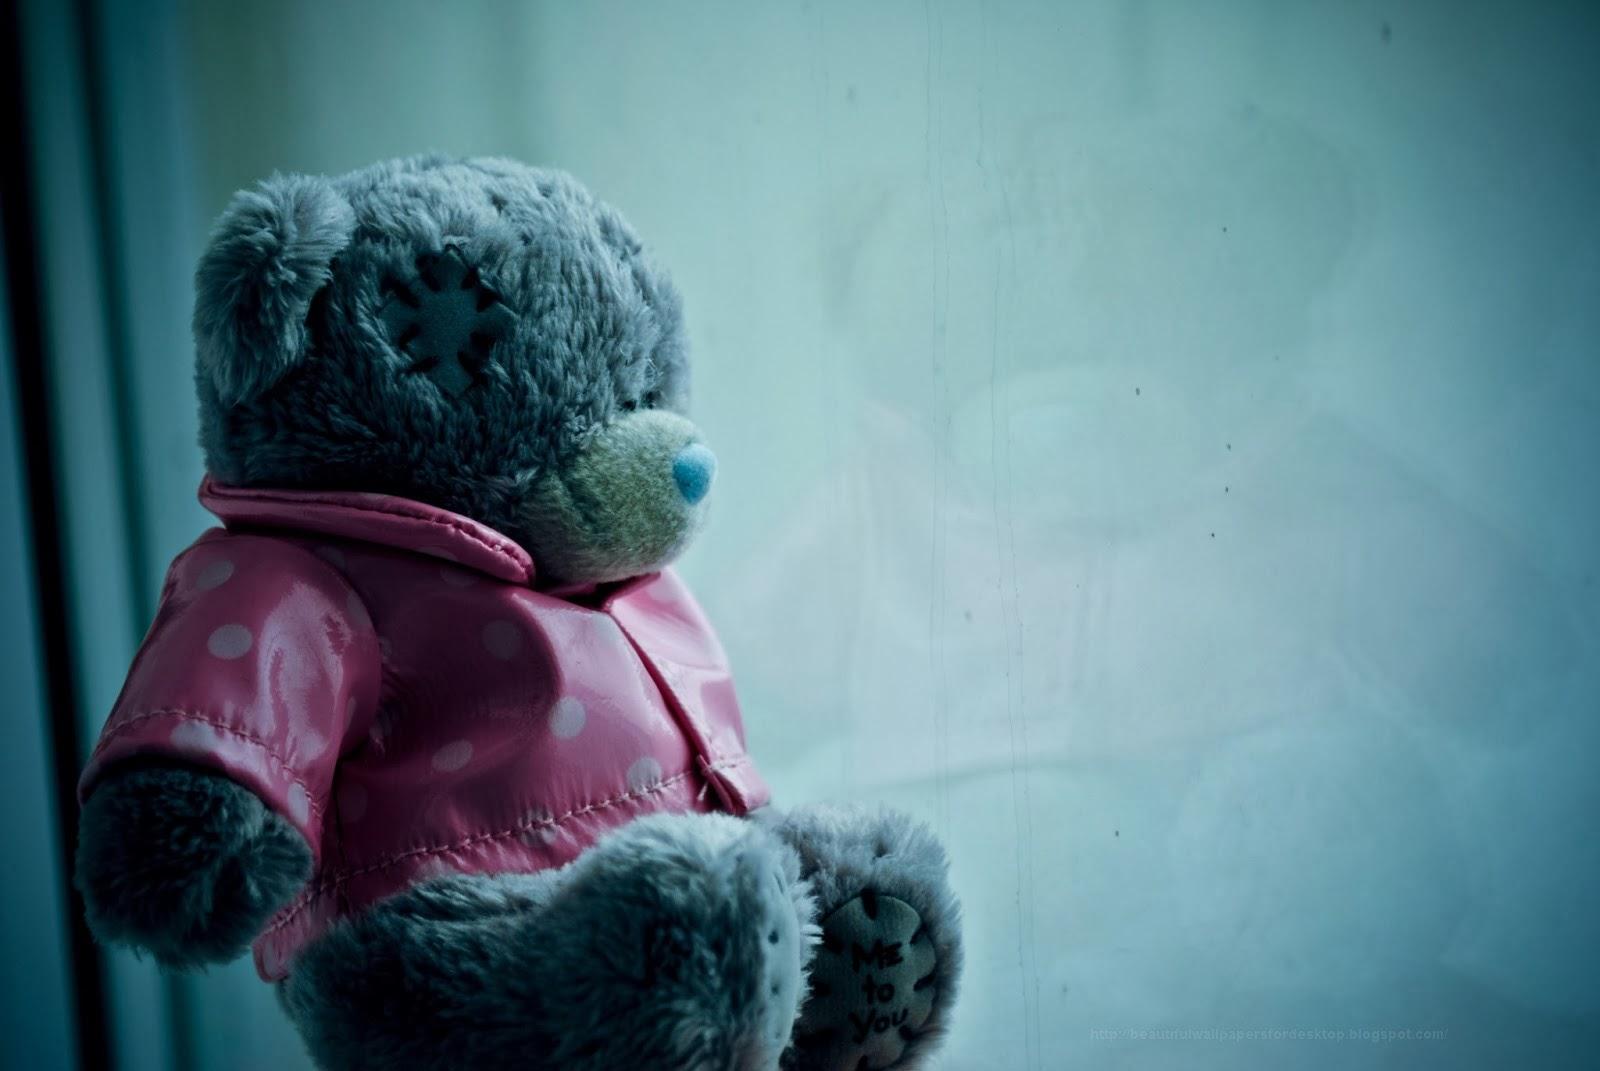 Iphone wallpaper love teddy bear wallpapers altavistaventures Images